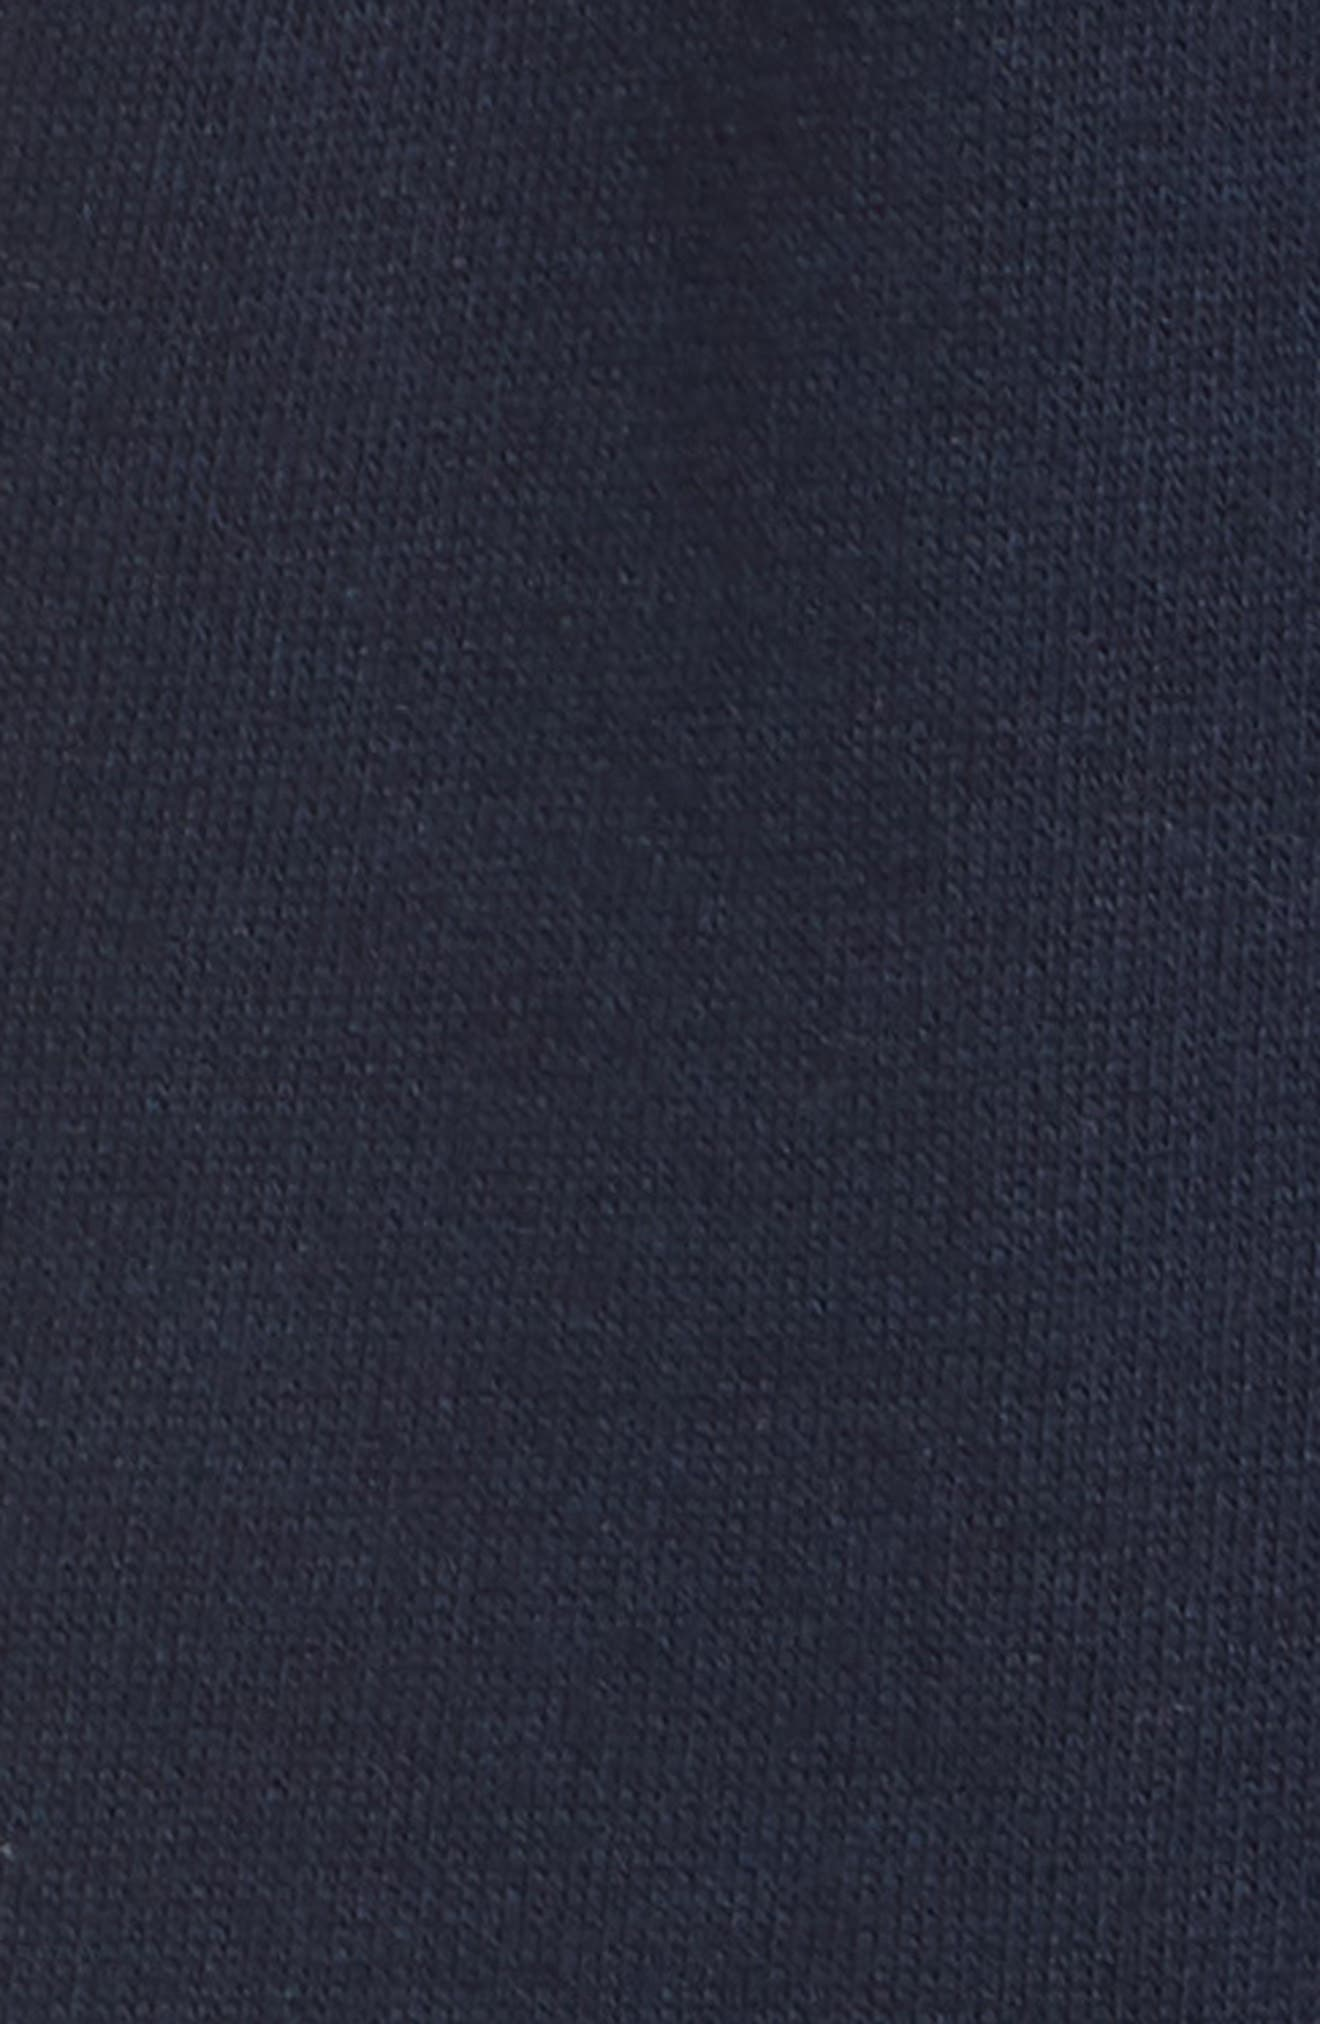 Lounge Shorts,                             Alternate thumbnail 5, color,                             429